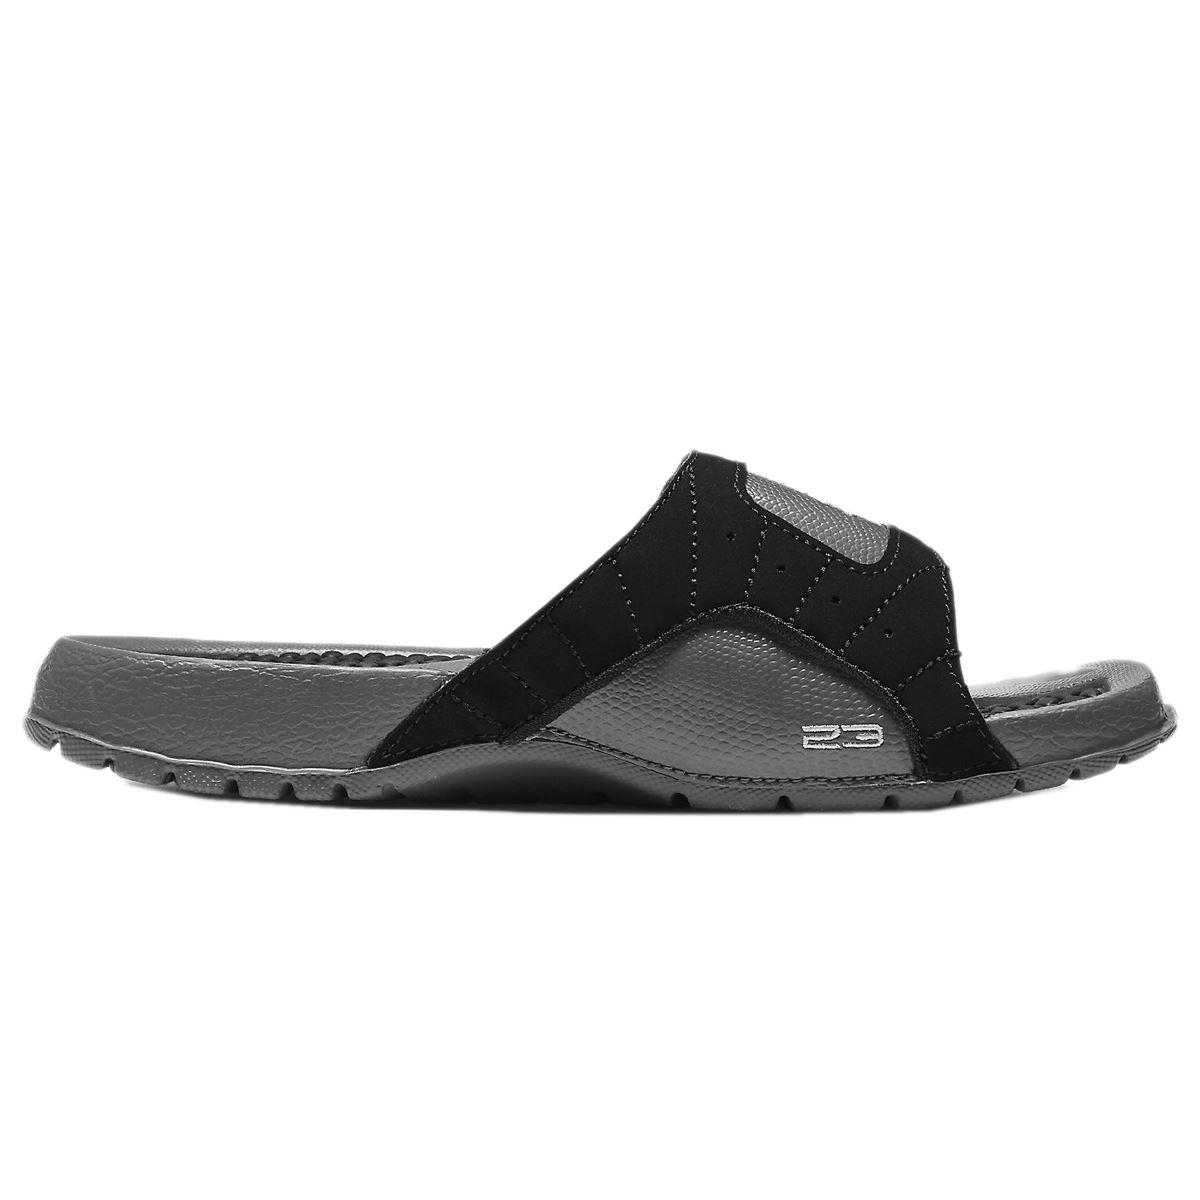 Black jordan sandals - Nike Jordan Hydro Xii Retro Black Grey Youth Sandals